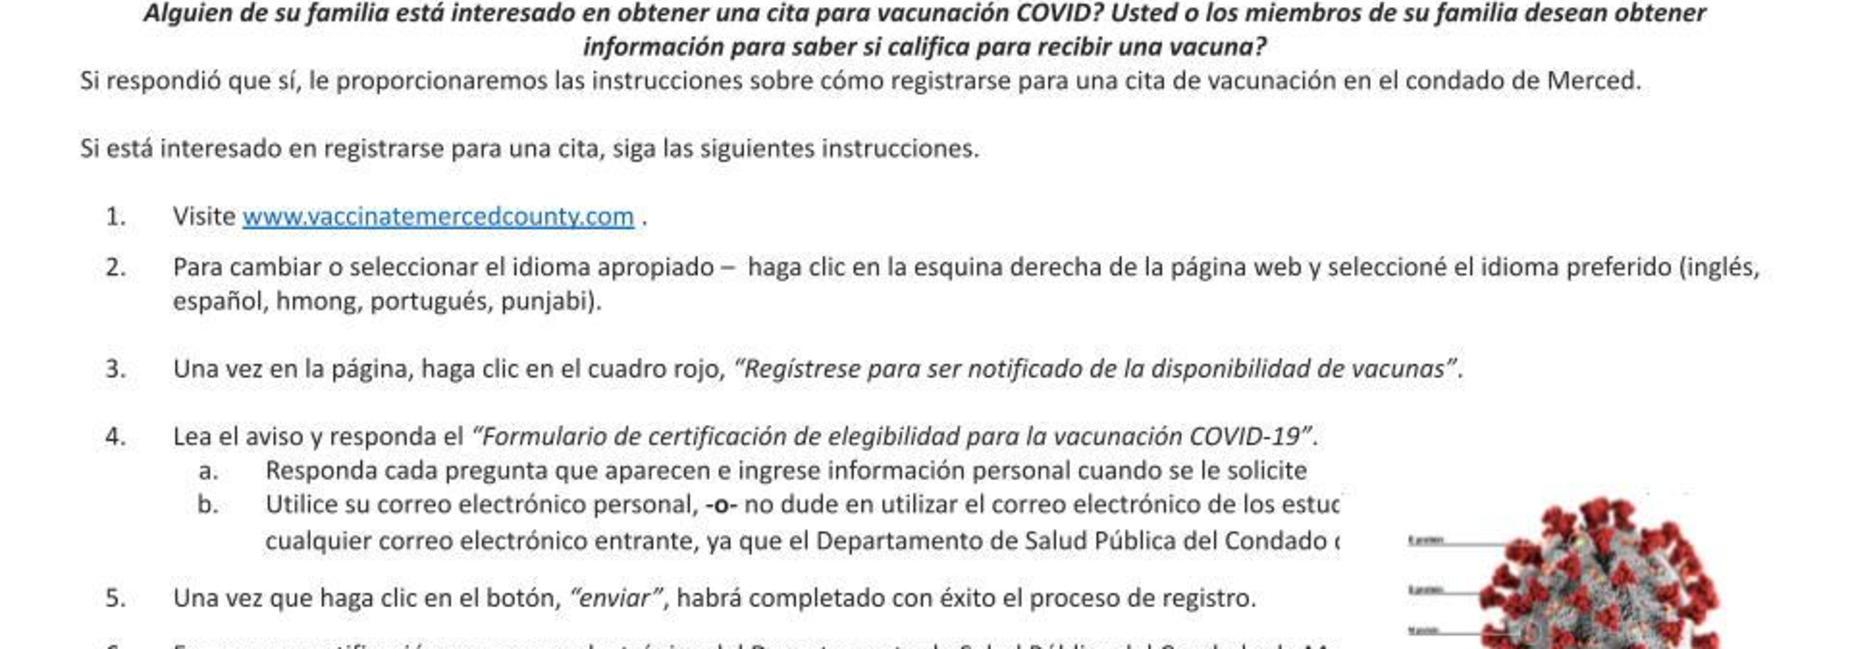 COVID Vaccine Information_English